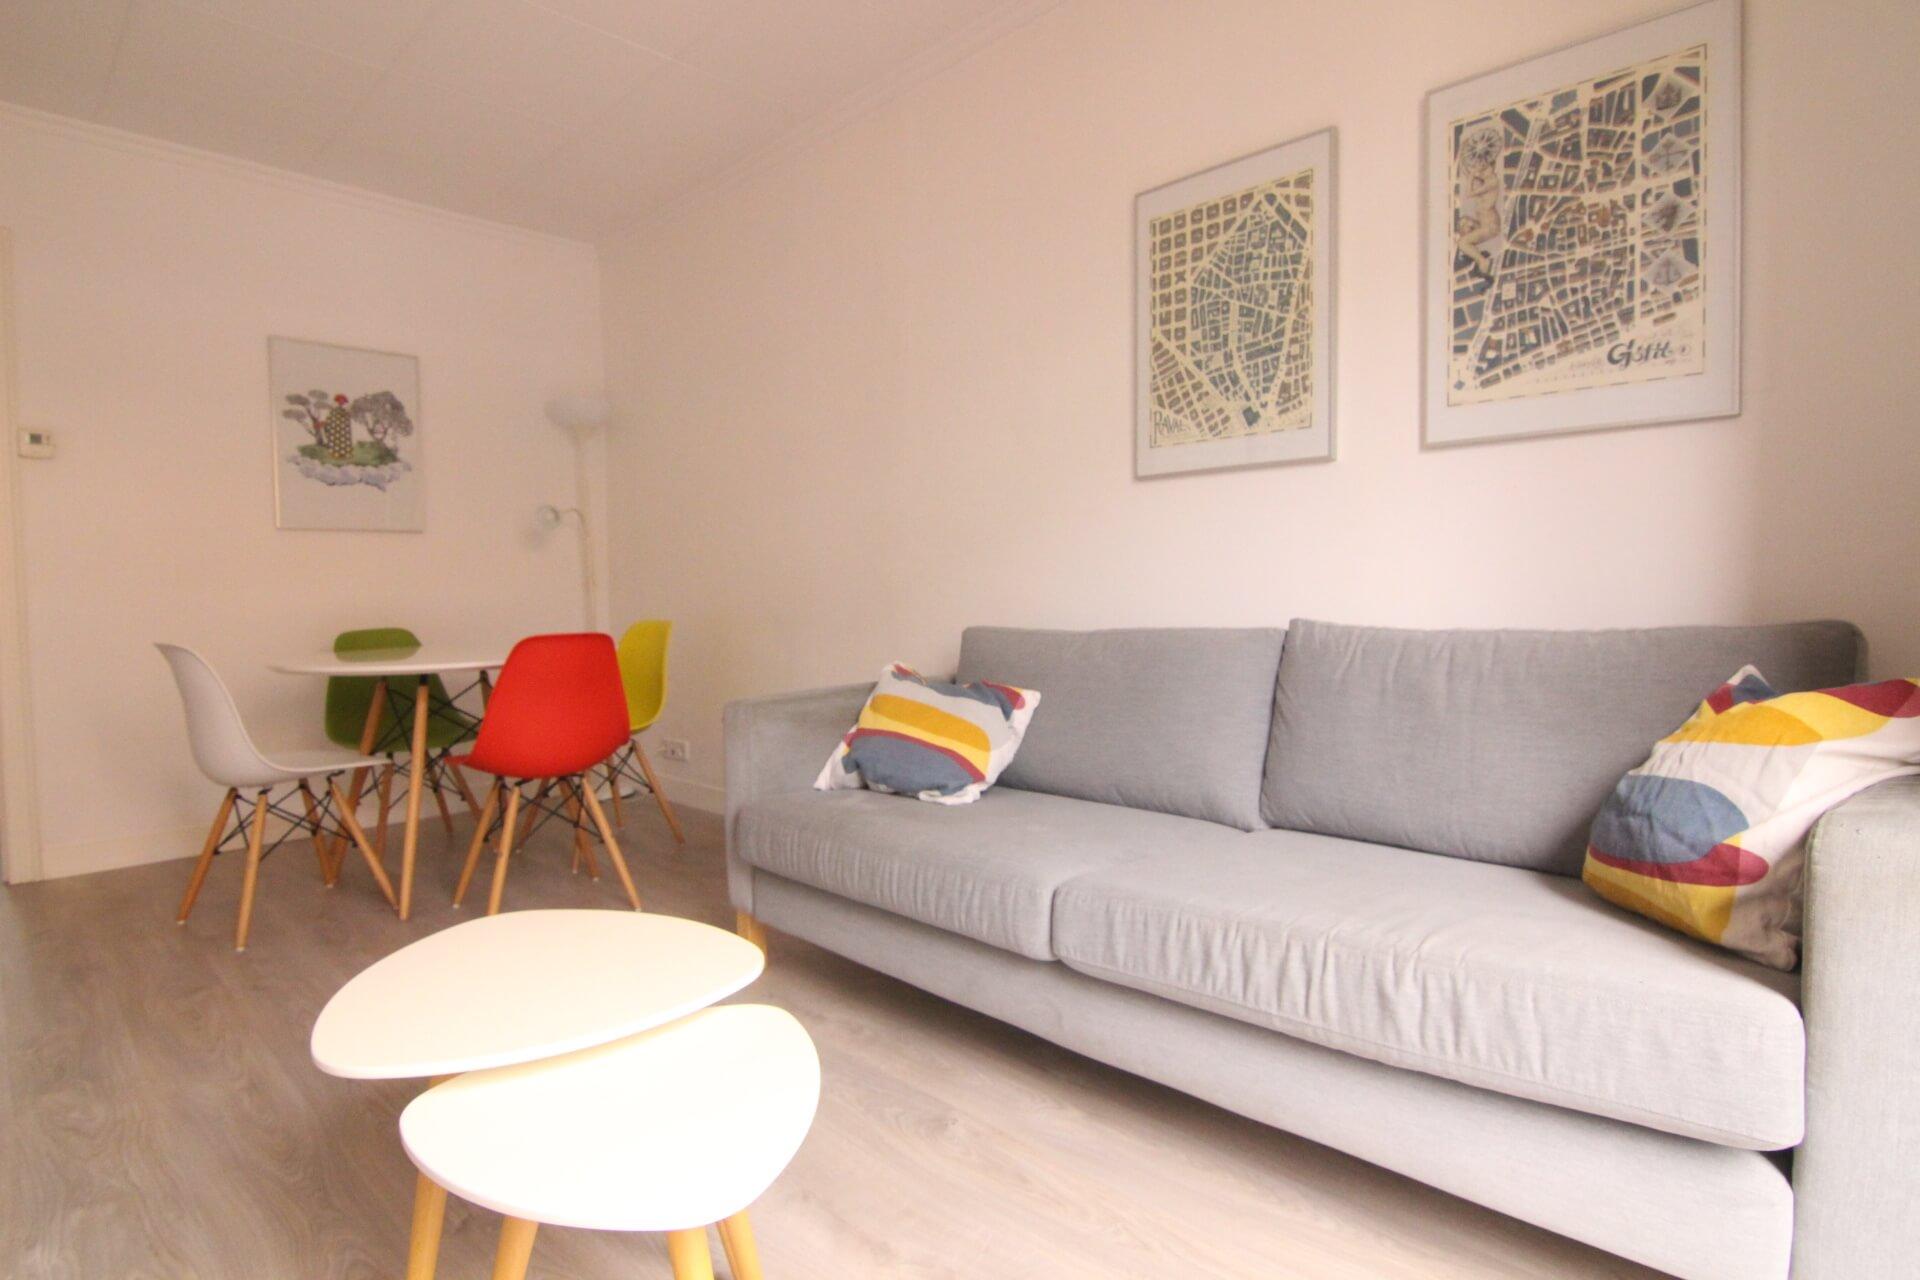 Flat for rent 2 double bedrooms carrer ricart